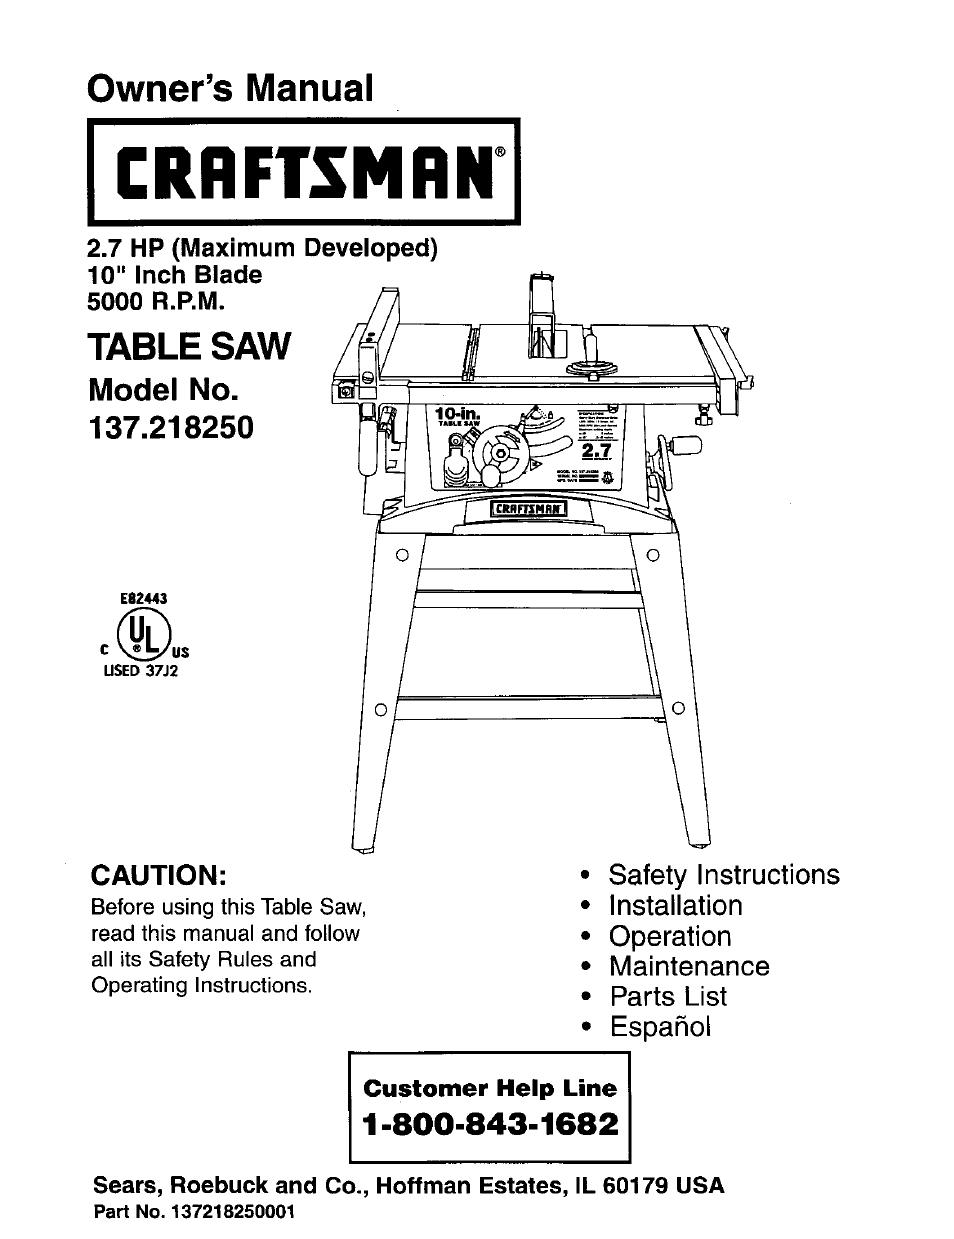 Craftsman 137 218250 User Manual | 36 pages